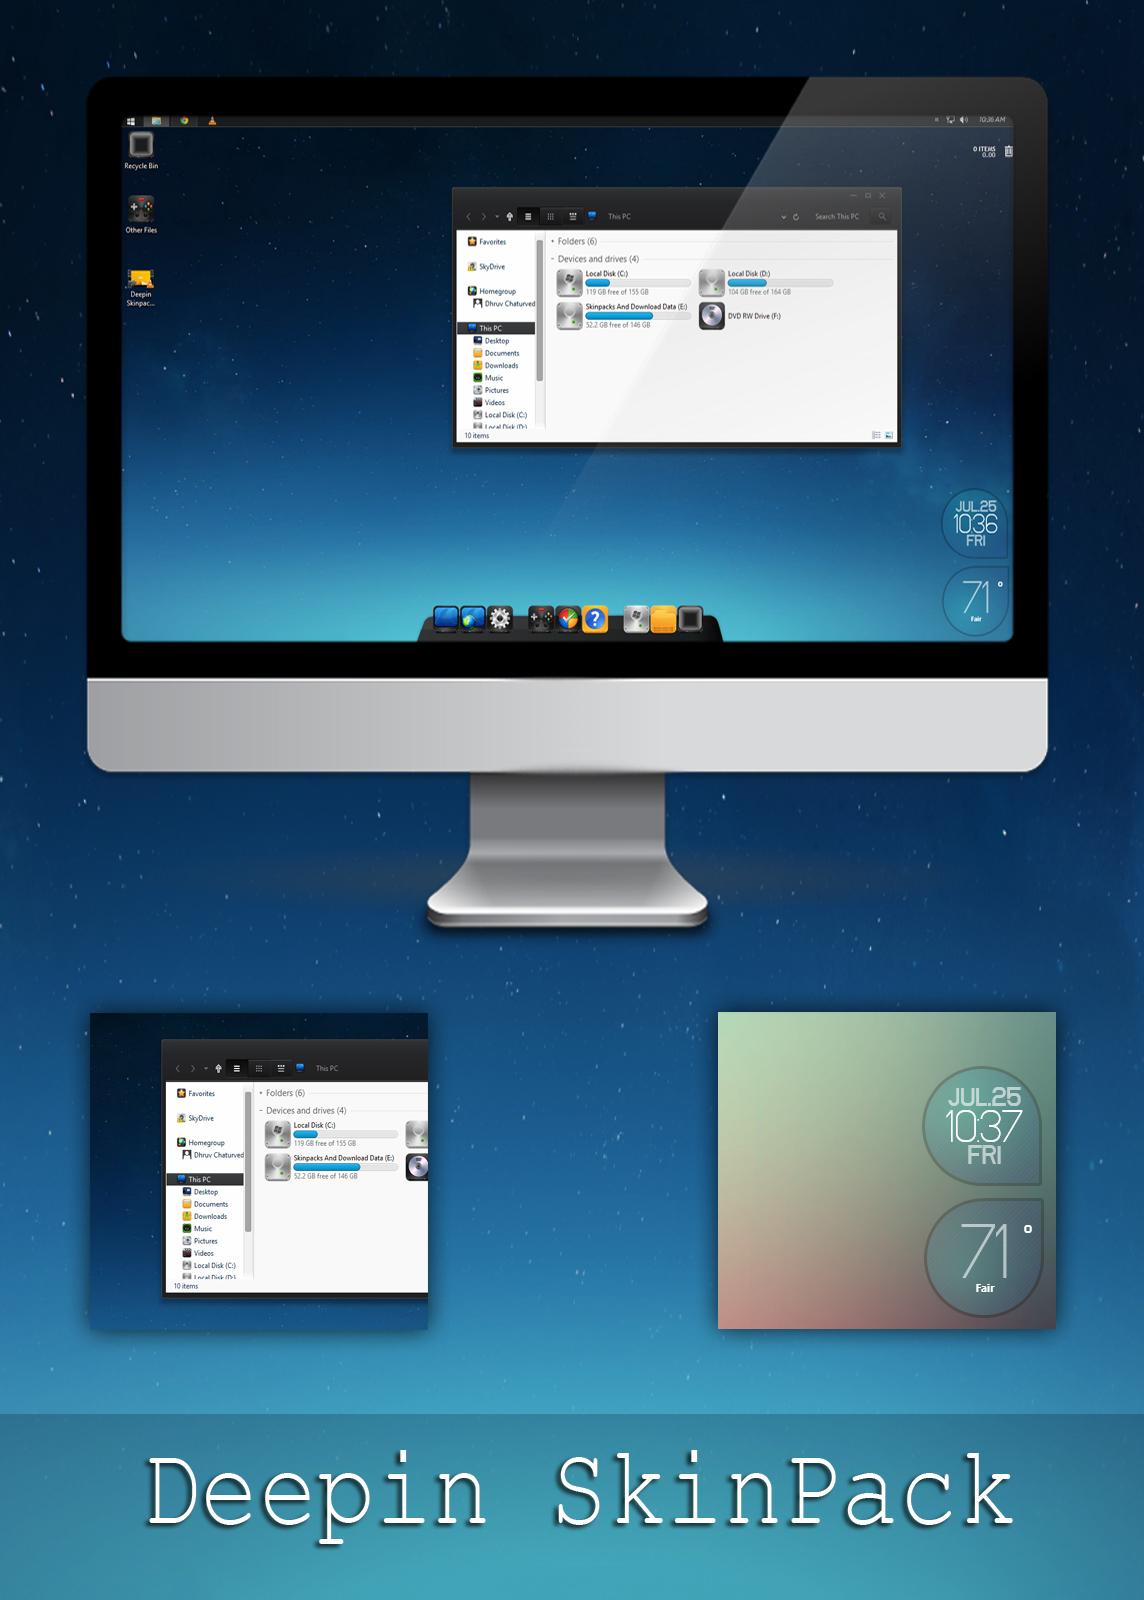 Download Skinpack Windows 7 : download, skinpack, windows, Deepin, Skinpack, Windows, 7/8/8.1, TheDhruv, DeviantArt